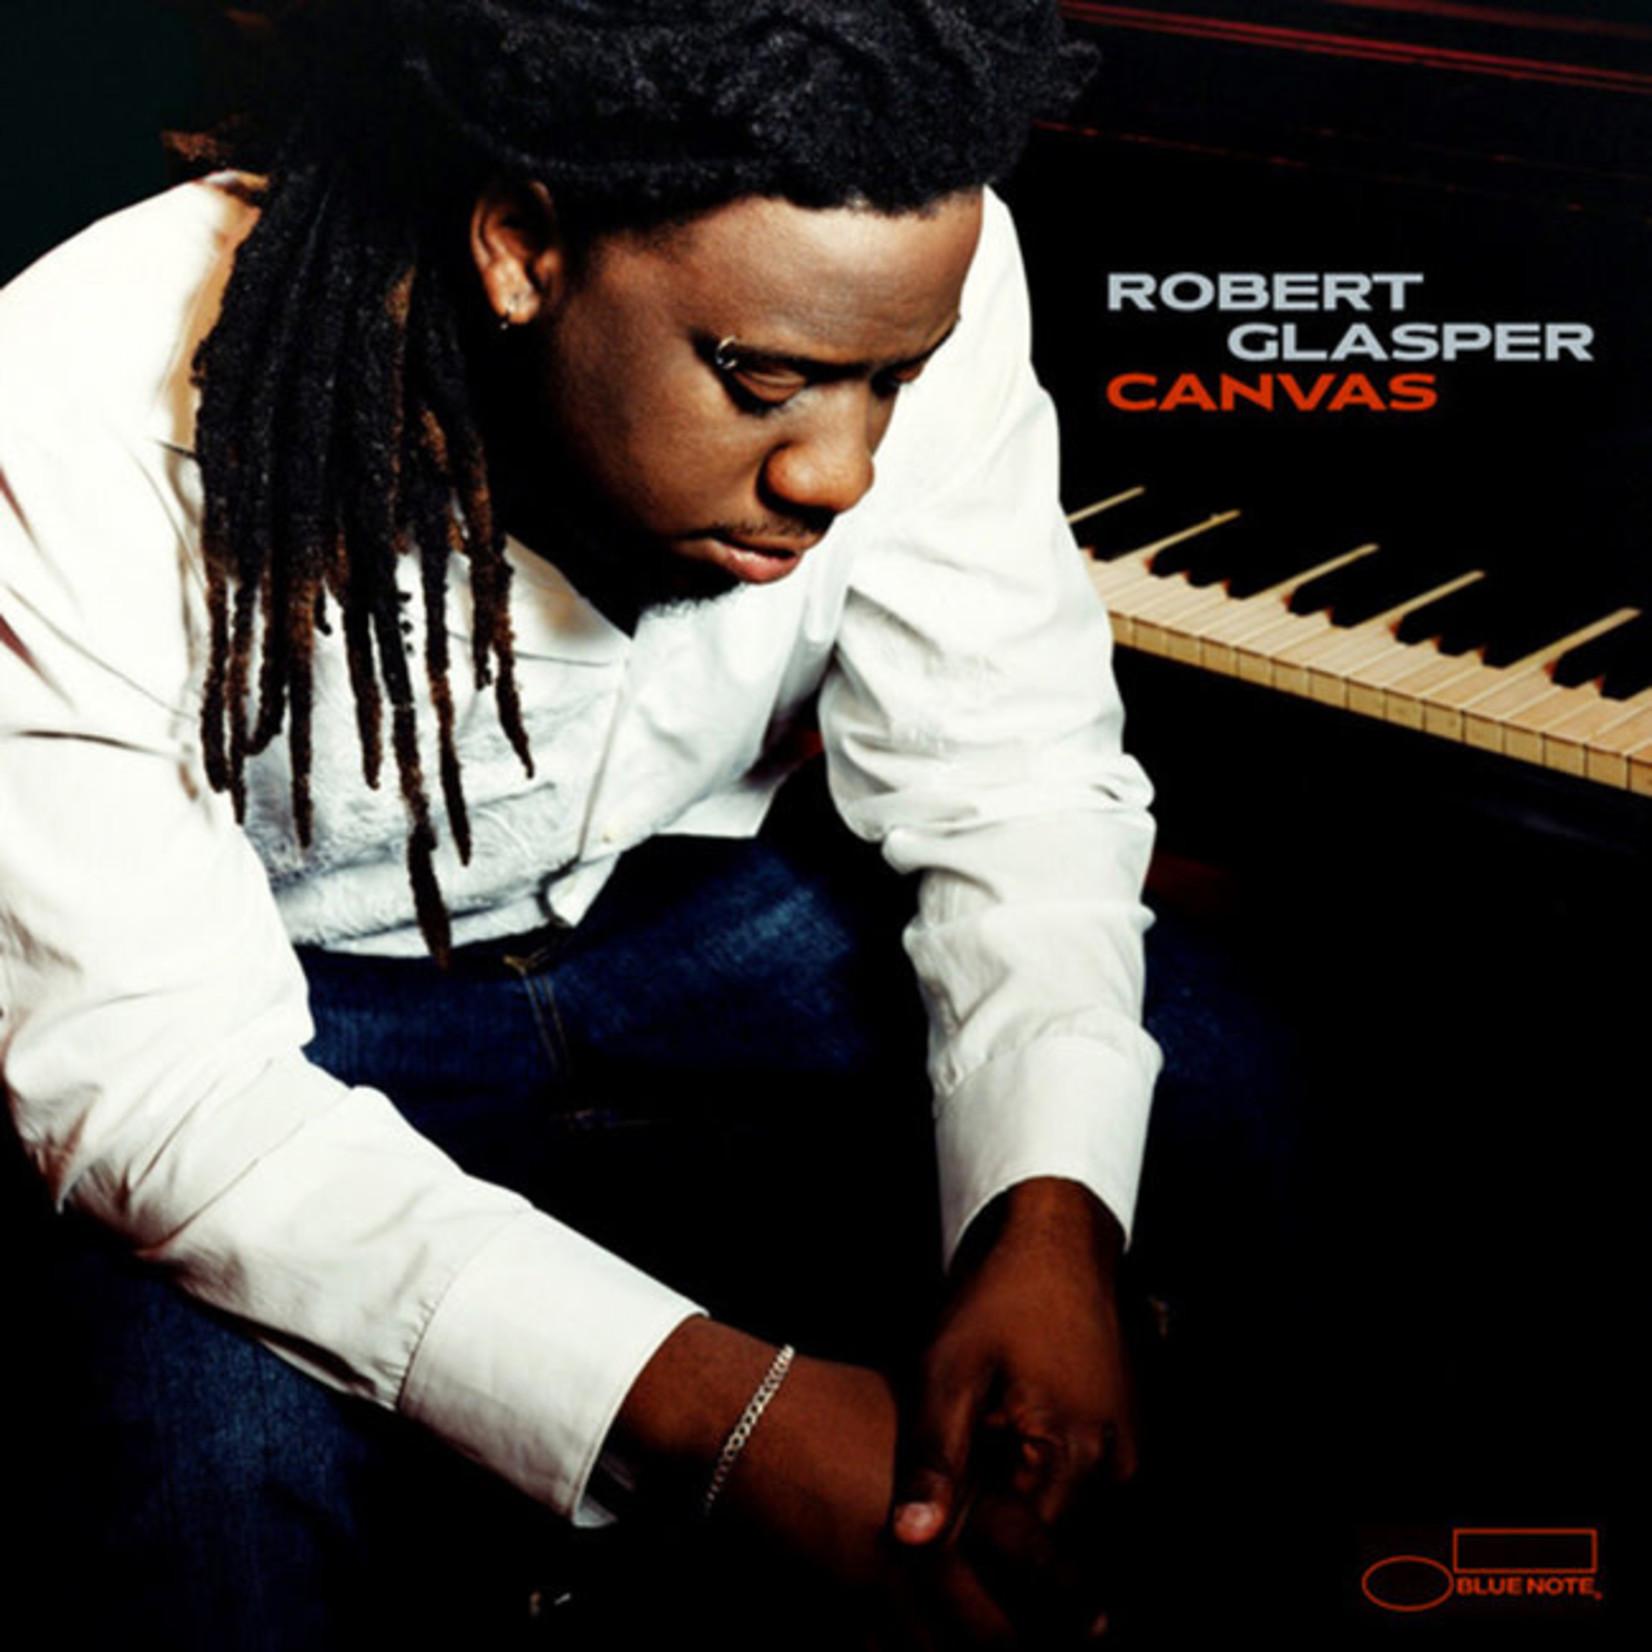 [New] Glasper, Robert: Canvas (Blue Note 80 Series) (2LP)